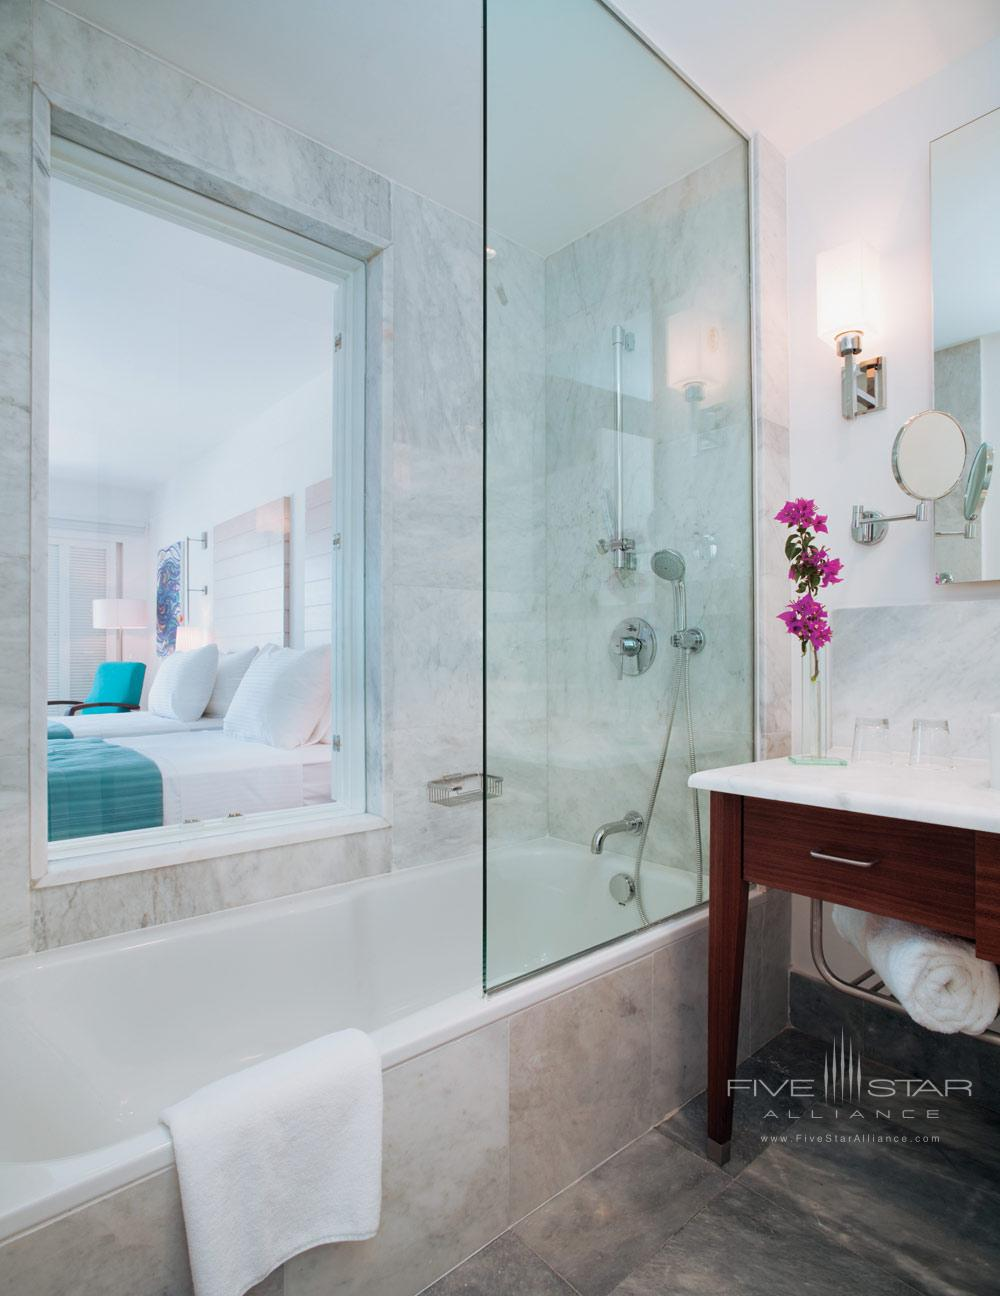 Bathroom at Doria Hotel Bodrum, Turkey